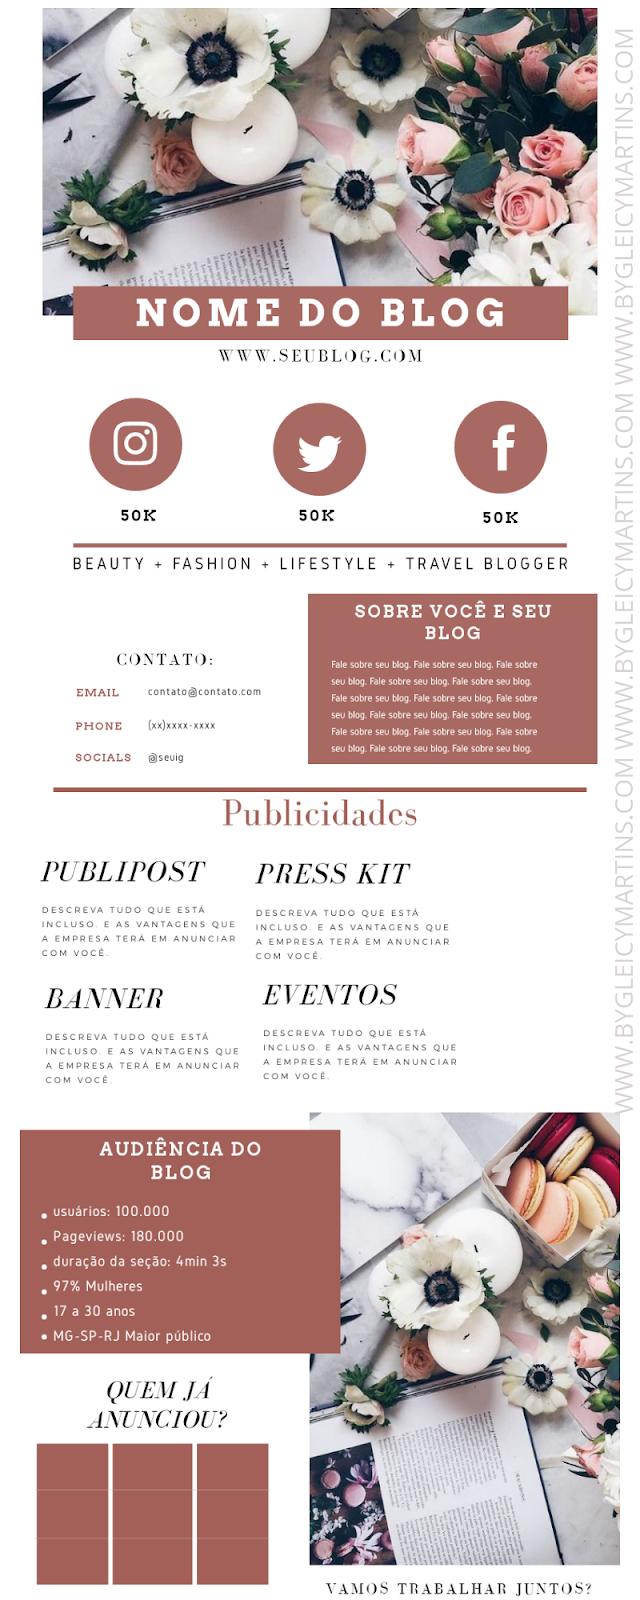 Como fazer mídia kit